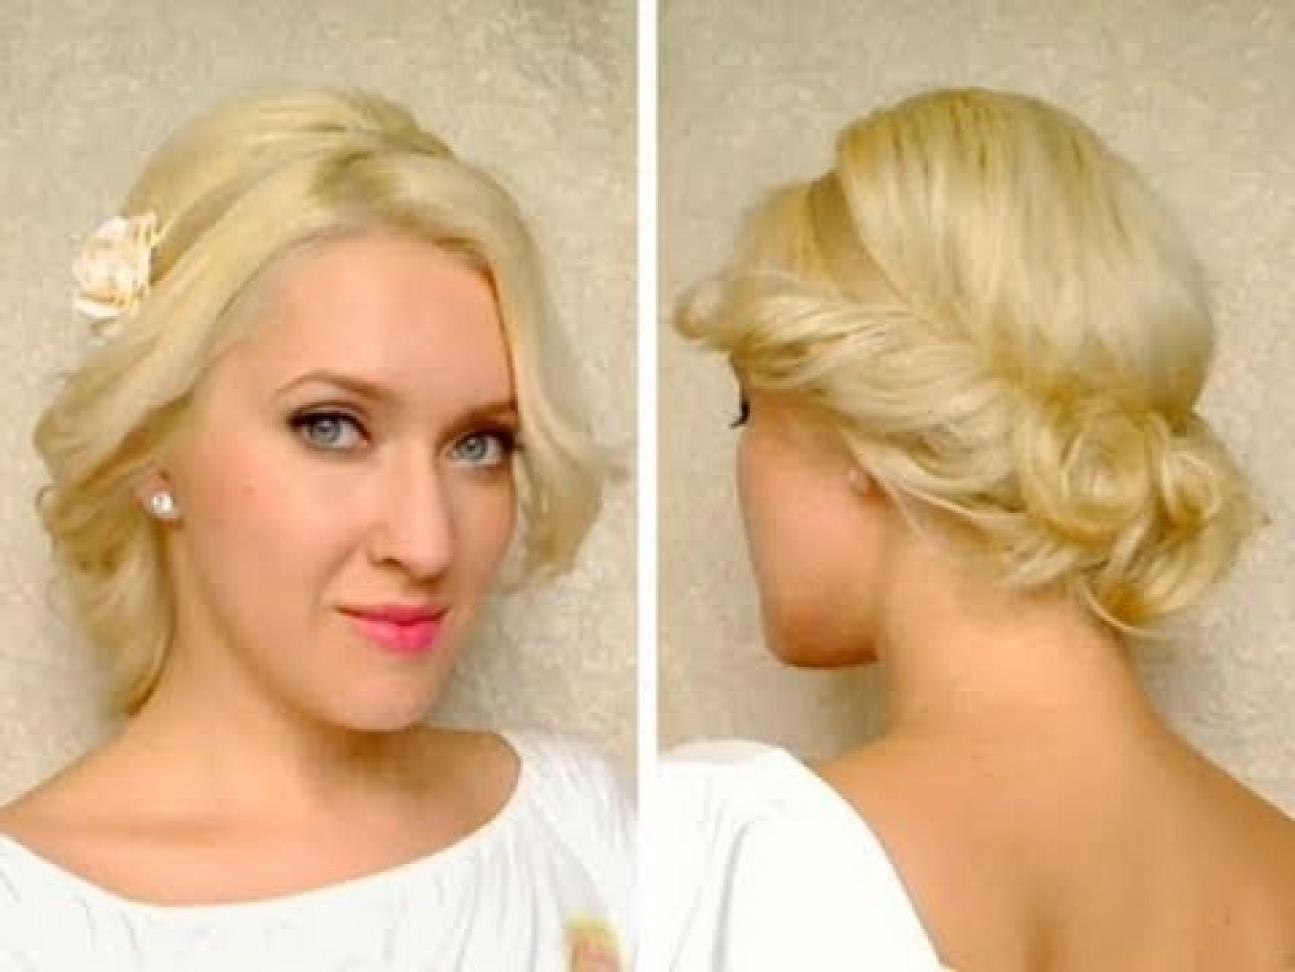 Hairstyles For Medium Hair Length Cute Easy Curly Updo Hairstyle With Updos For Medium Length Curly Hair (View 5 of 15)